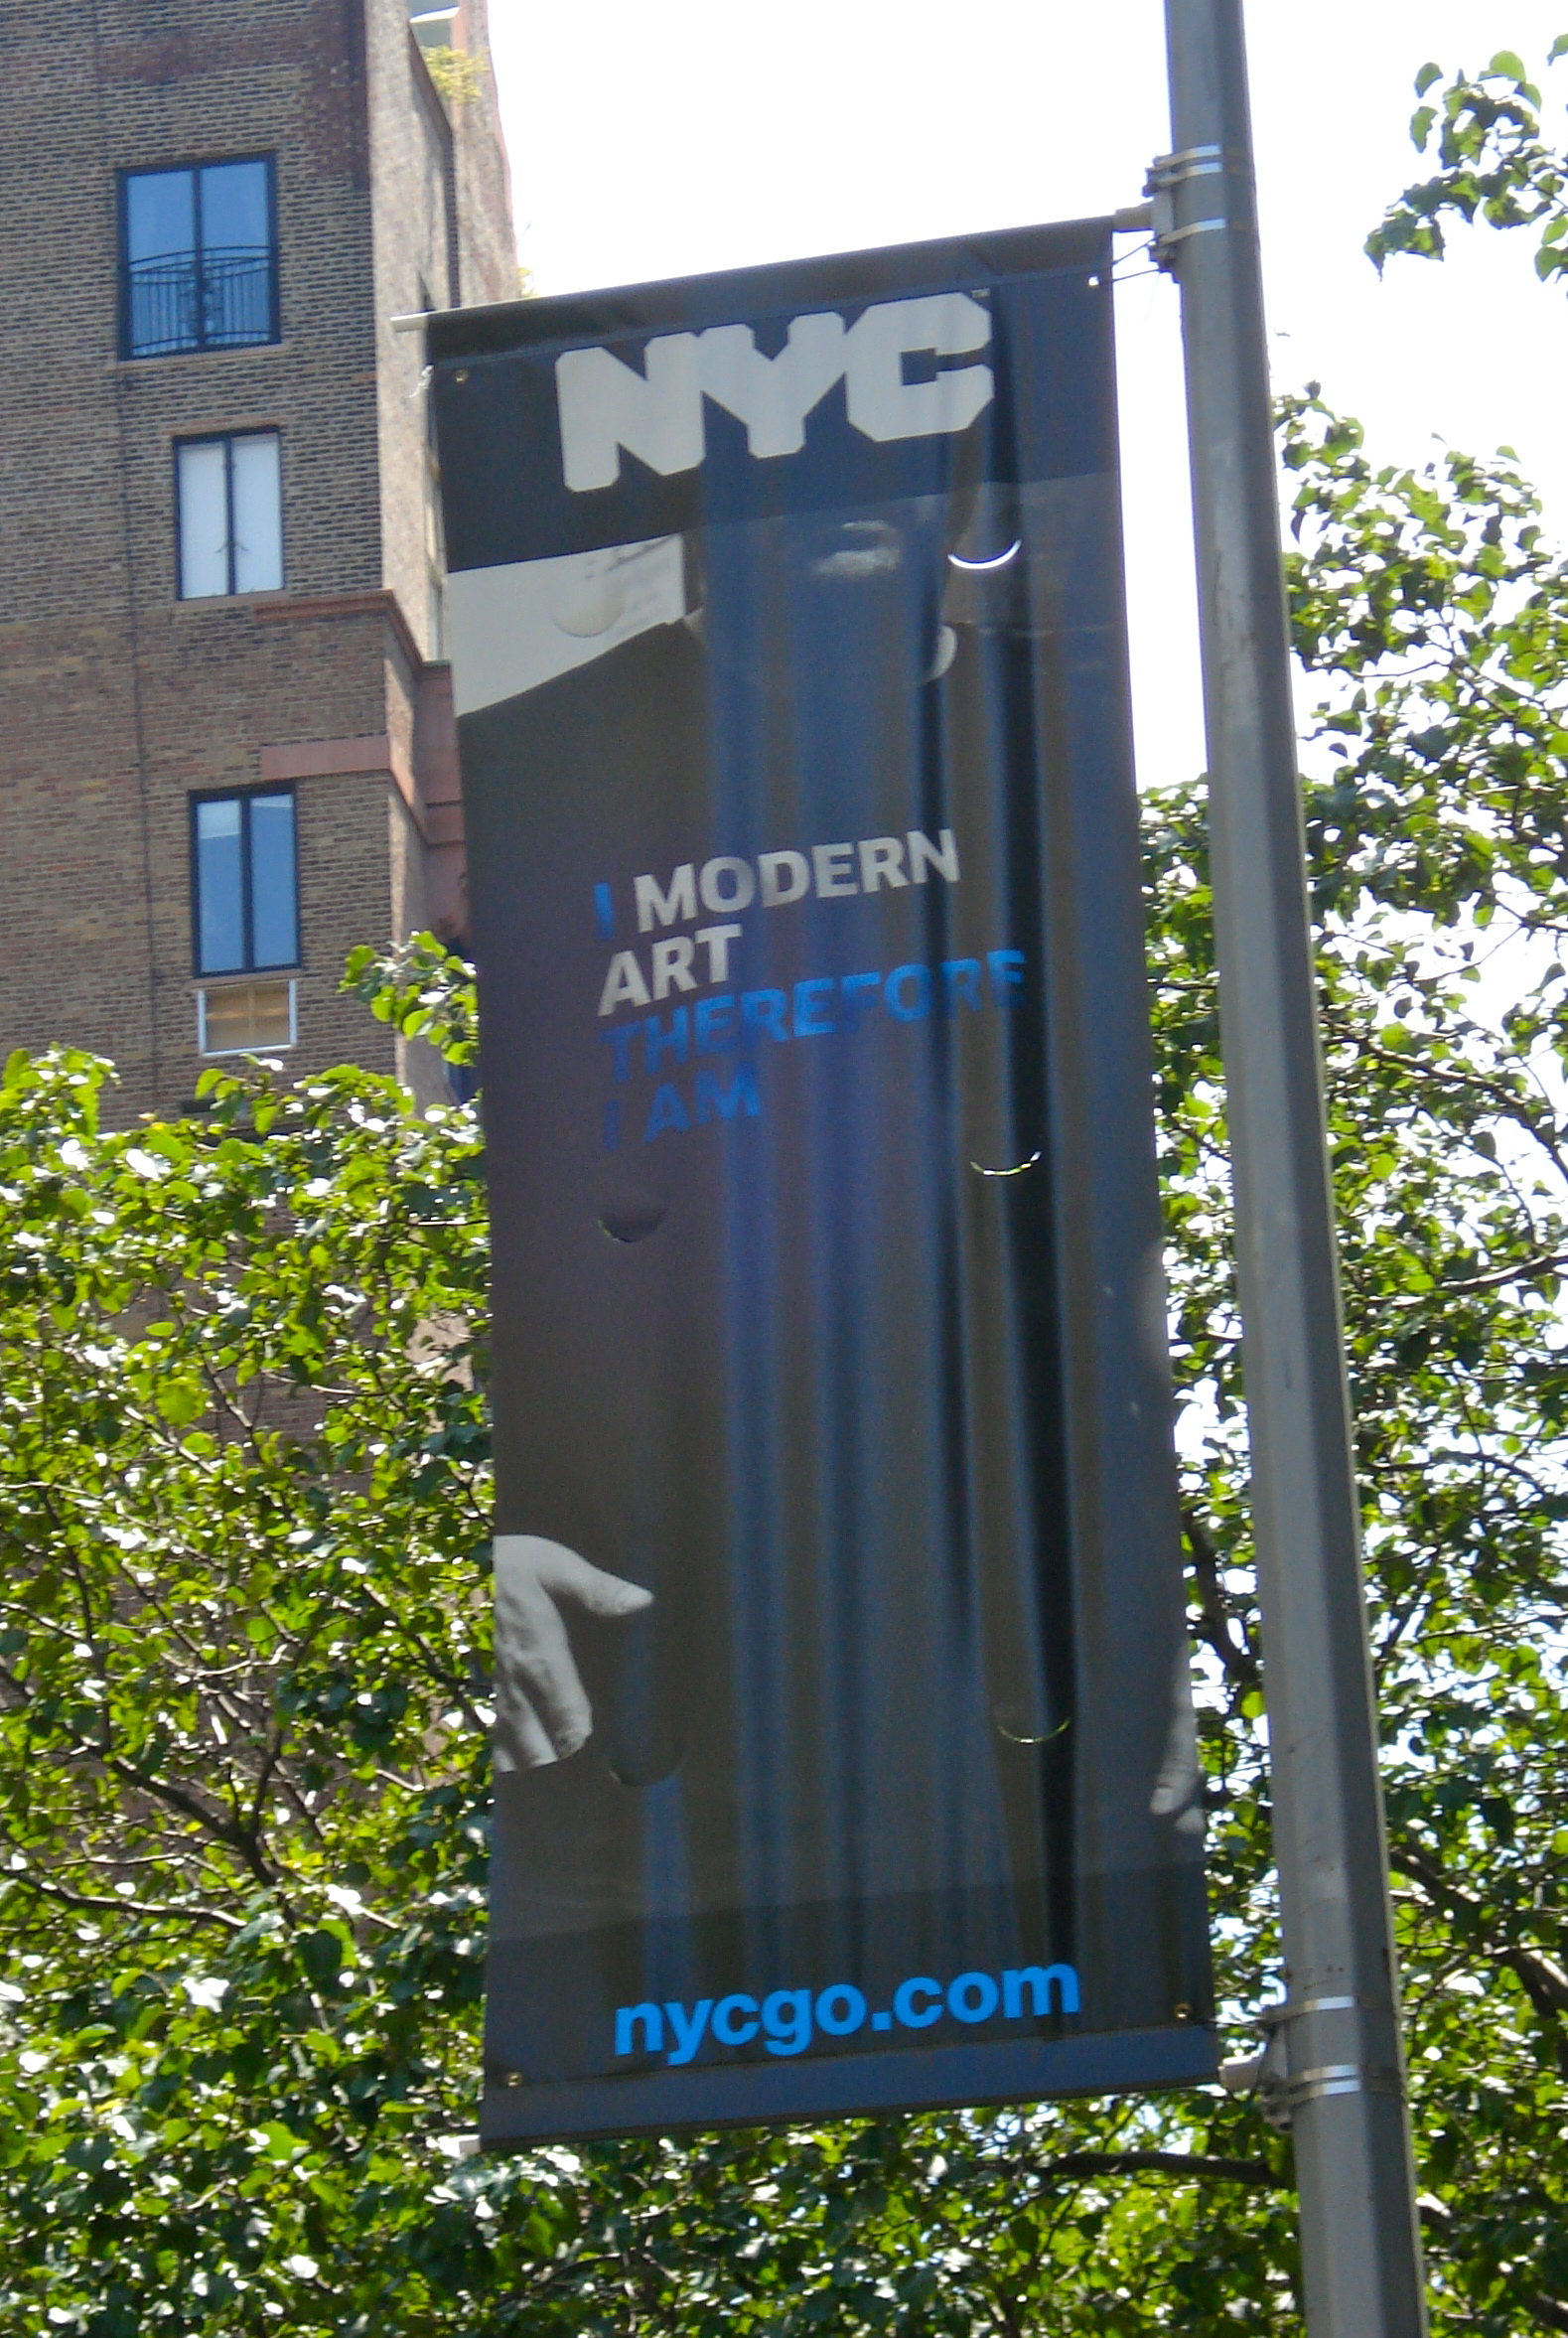 I modern art, therefore I am.  Yes.  Yes I do.  Yes I am.